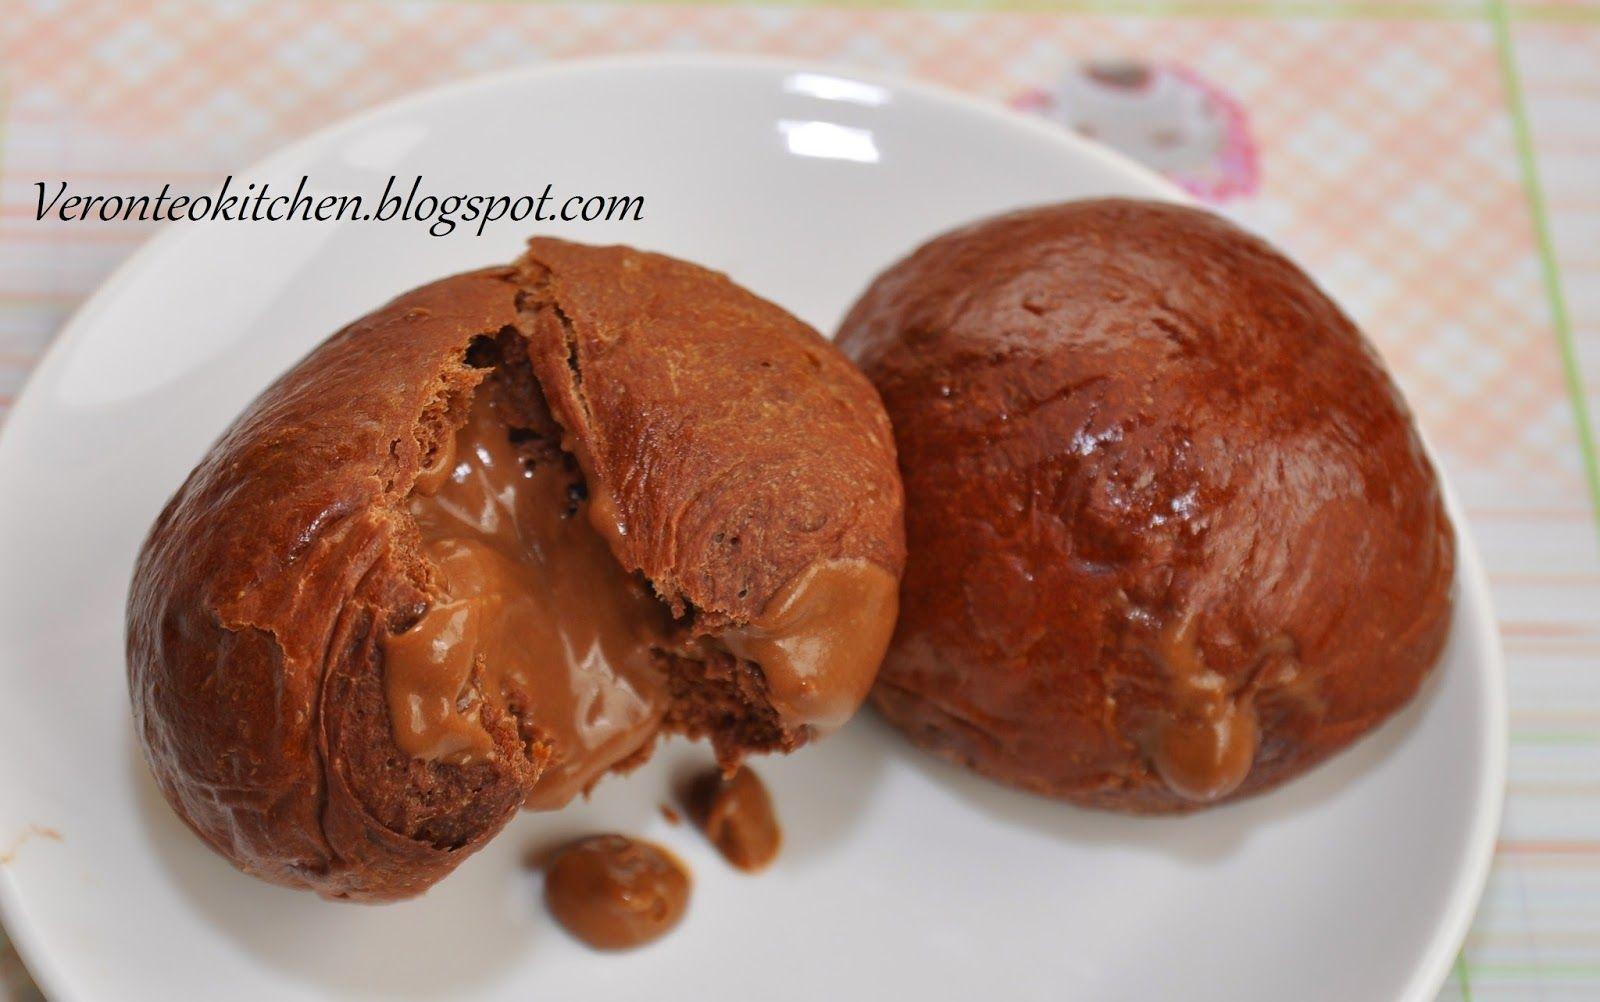 Chocolate molten lava bread 巧克嚛爆浆面圅